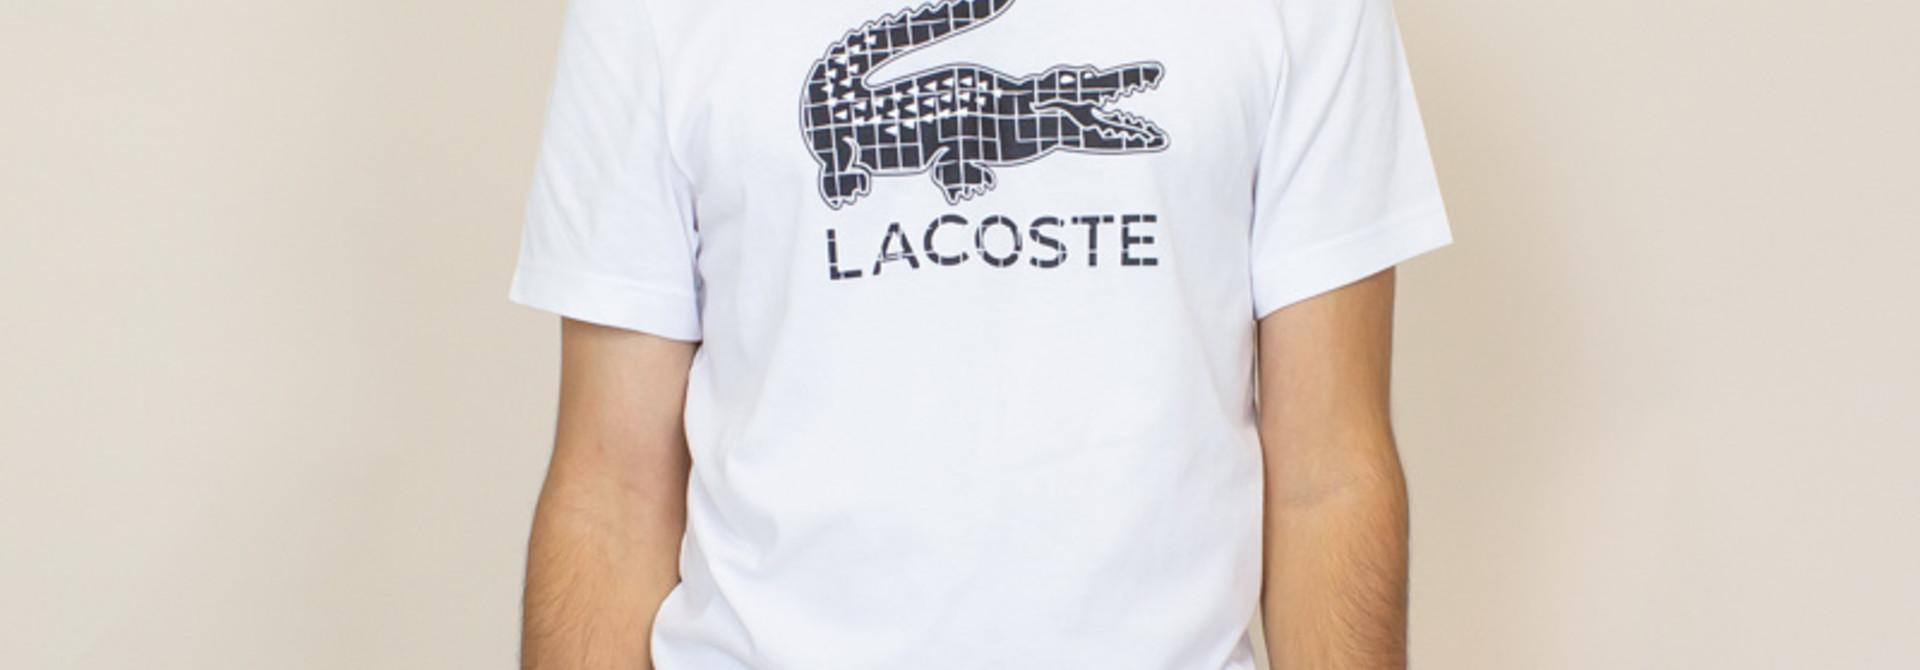 Lacoste 3D Print Crocodile Jersey T-shirt - White